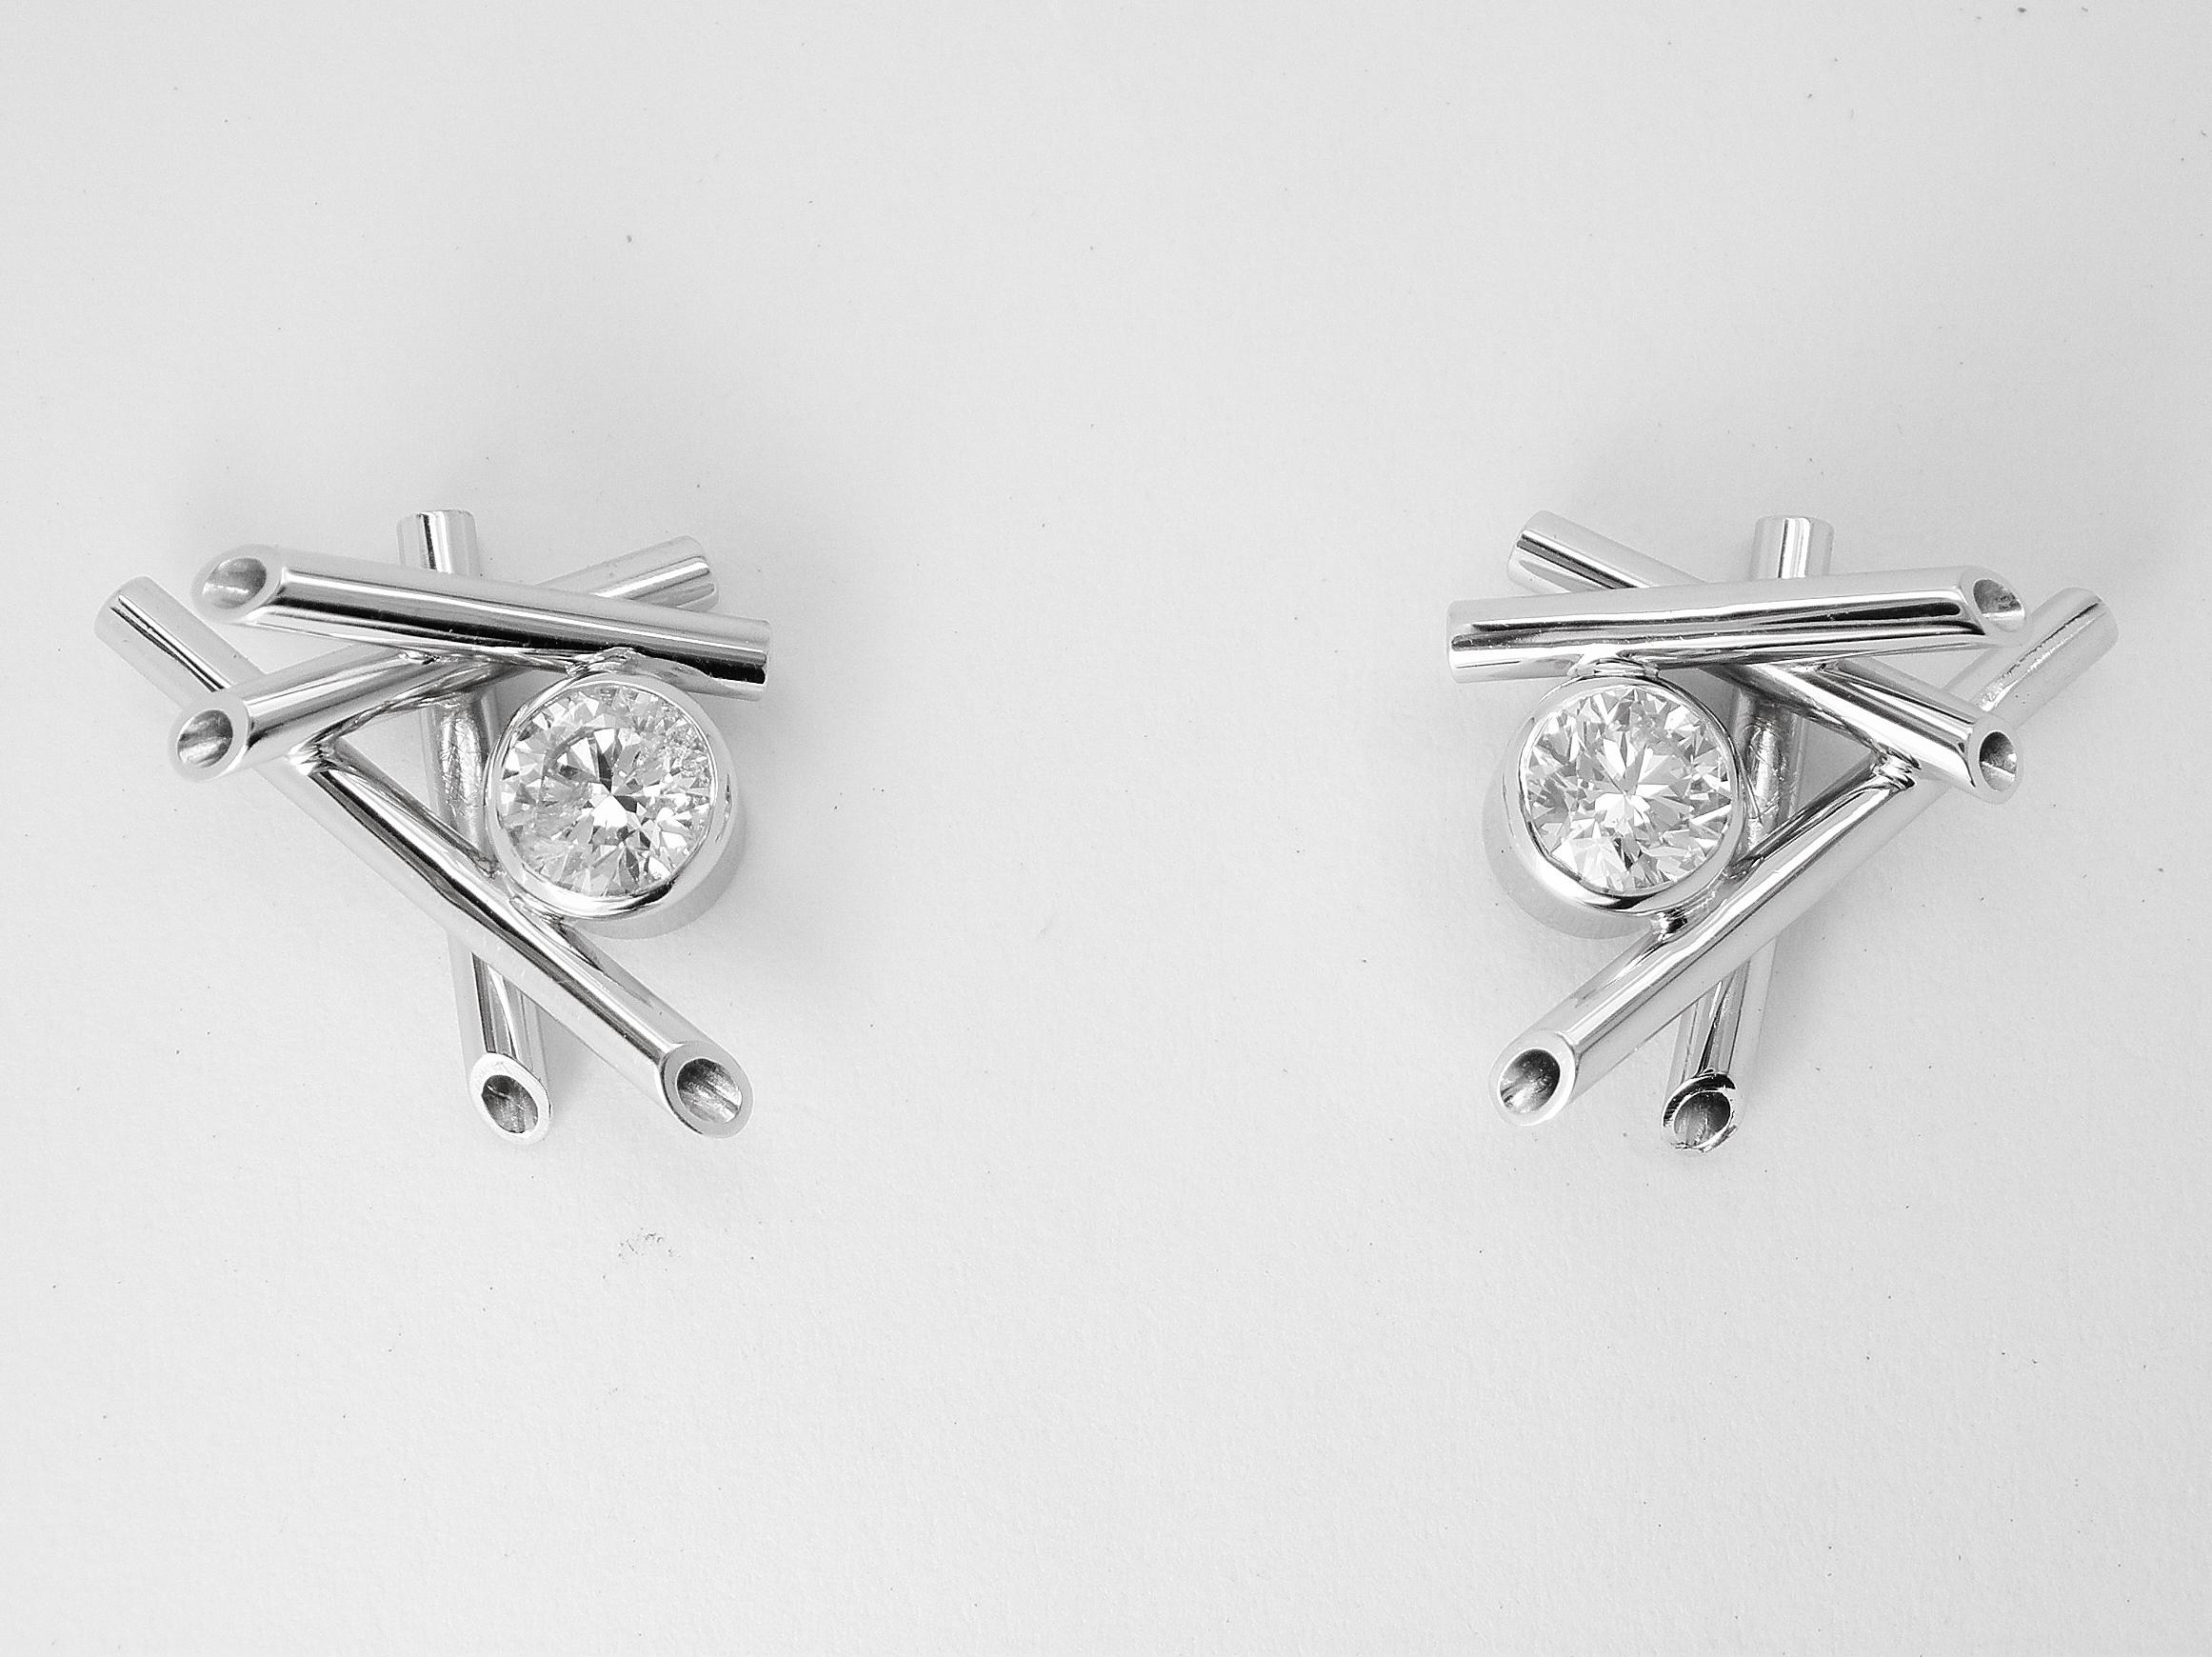 Single stone round brilliant cut diamond 'chop stick' style 18ct. white gold ear studs.